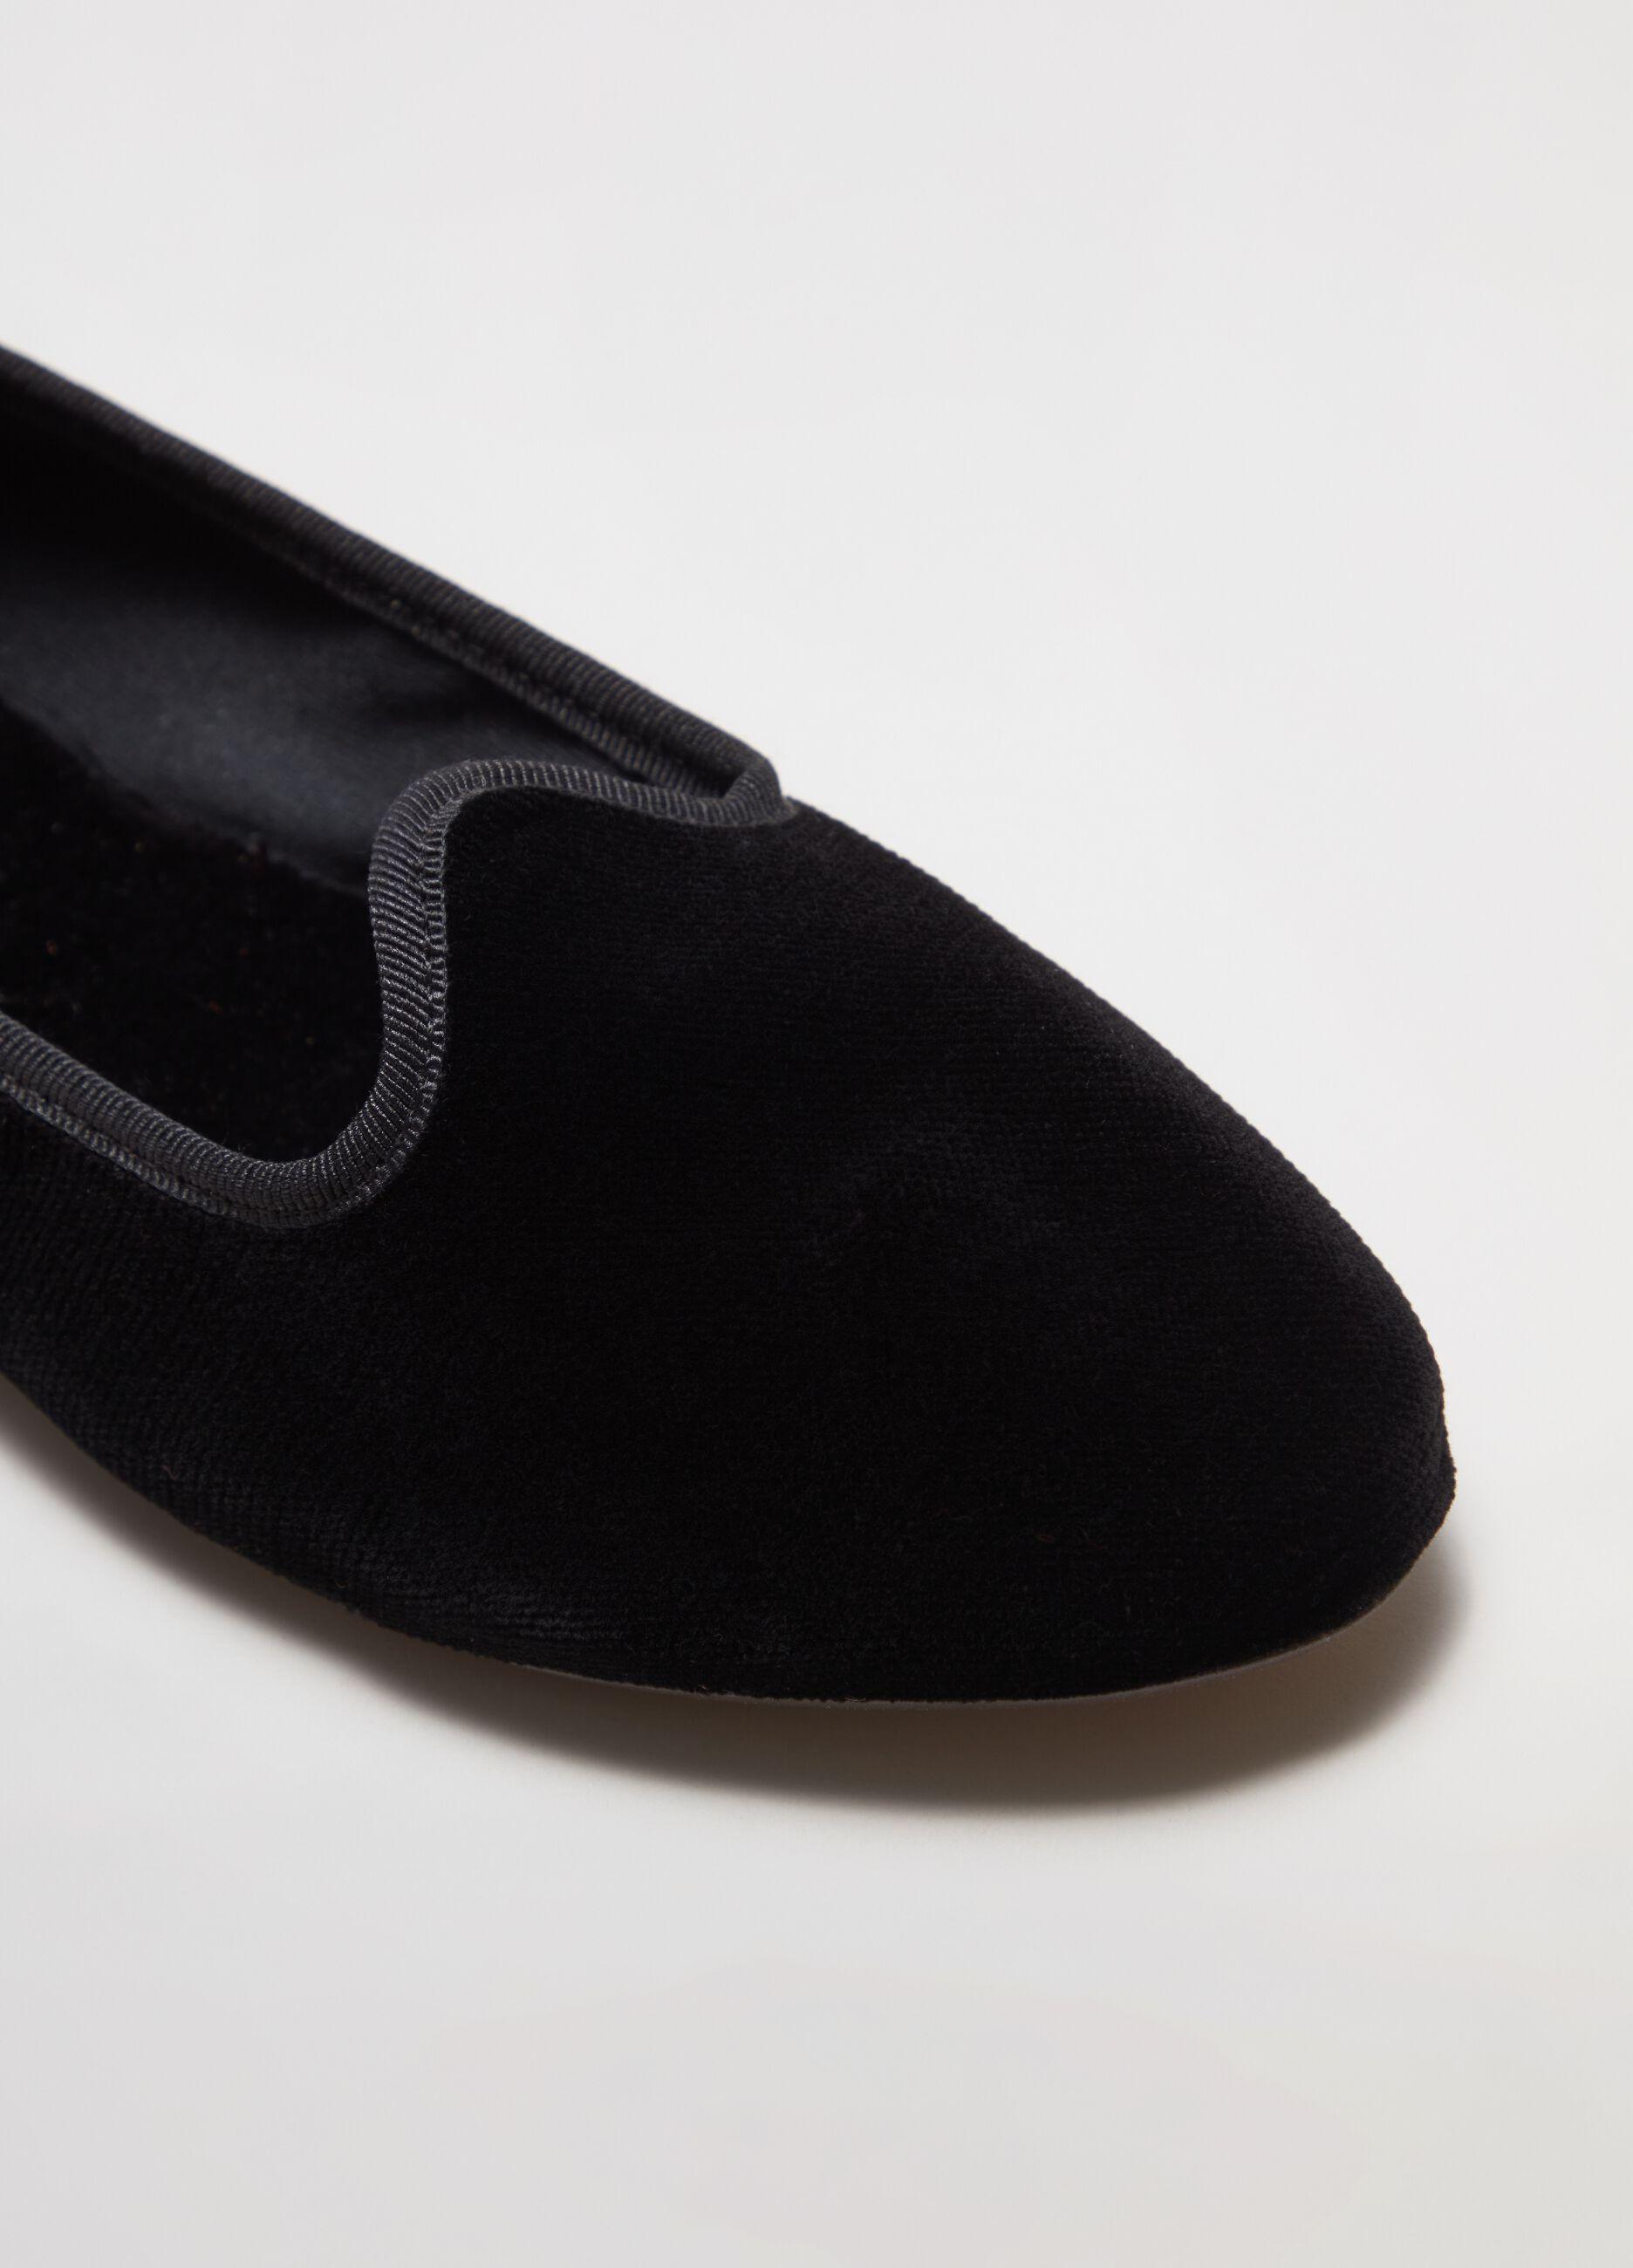 Scarpa friulana Nero